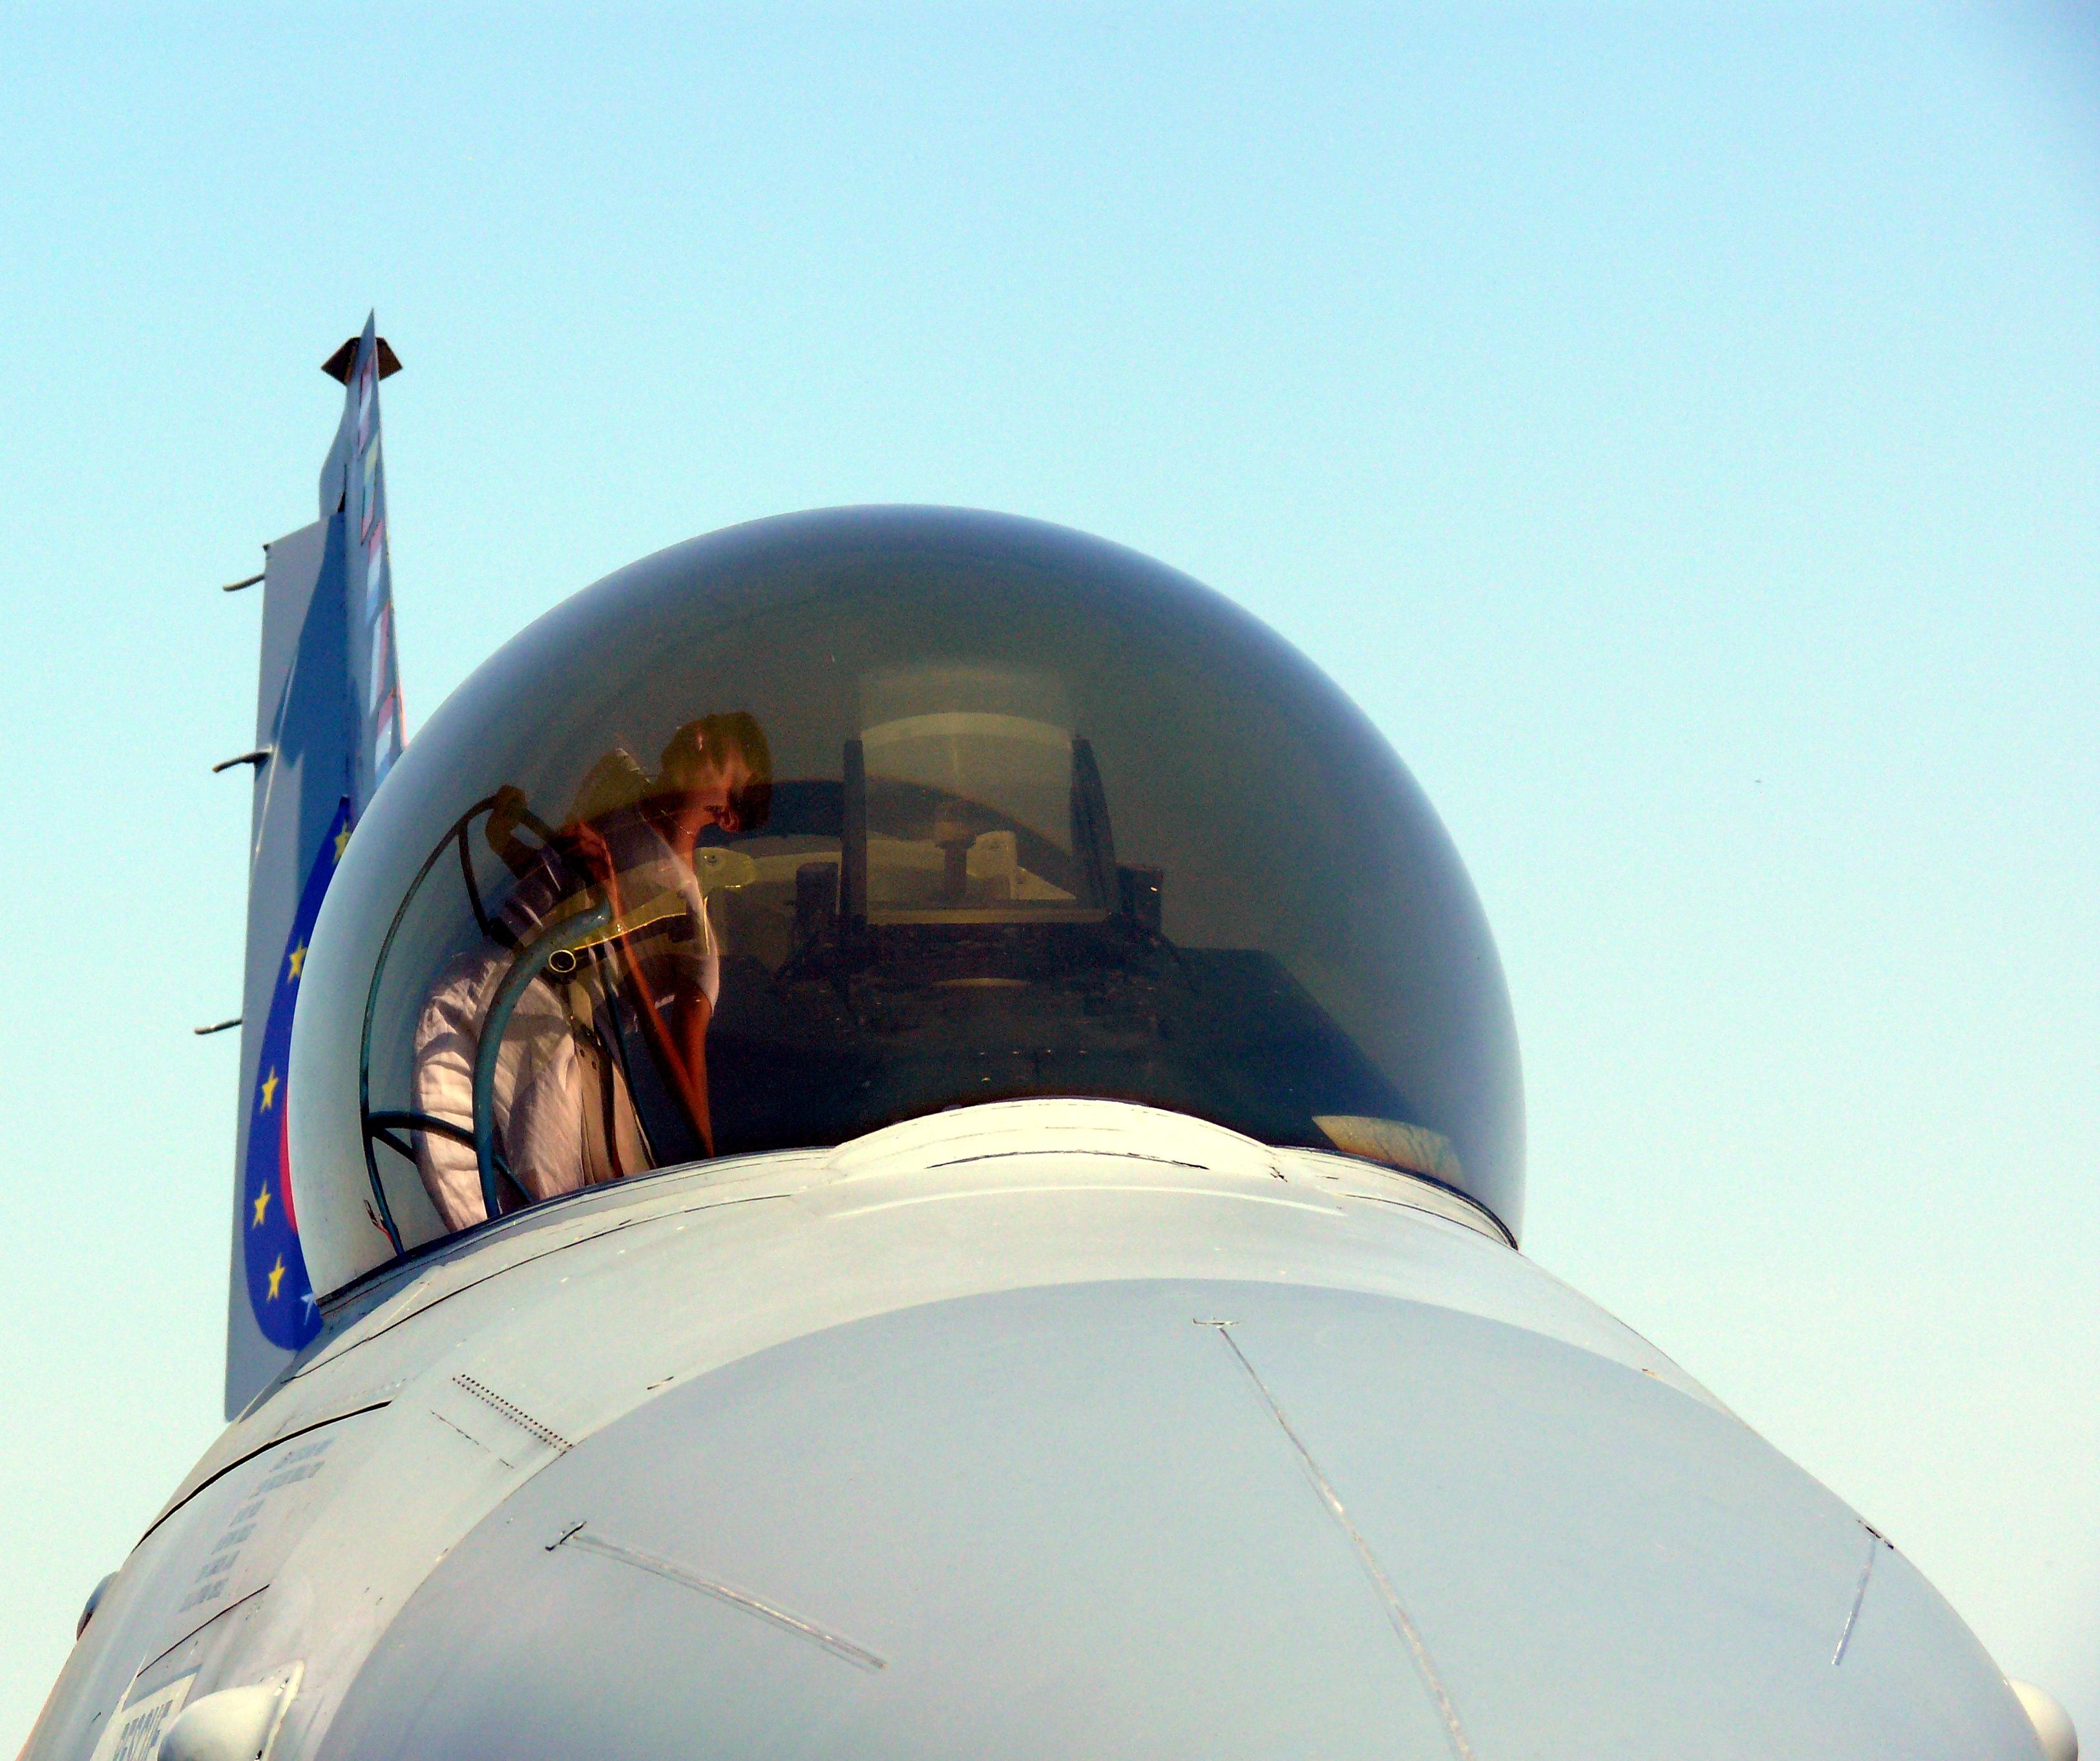 FileCanopy of F-16 Fighting Falcon.jpg & File:Canopy of F-16 Fighting Falcon.jpg - Wikimedia Commons